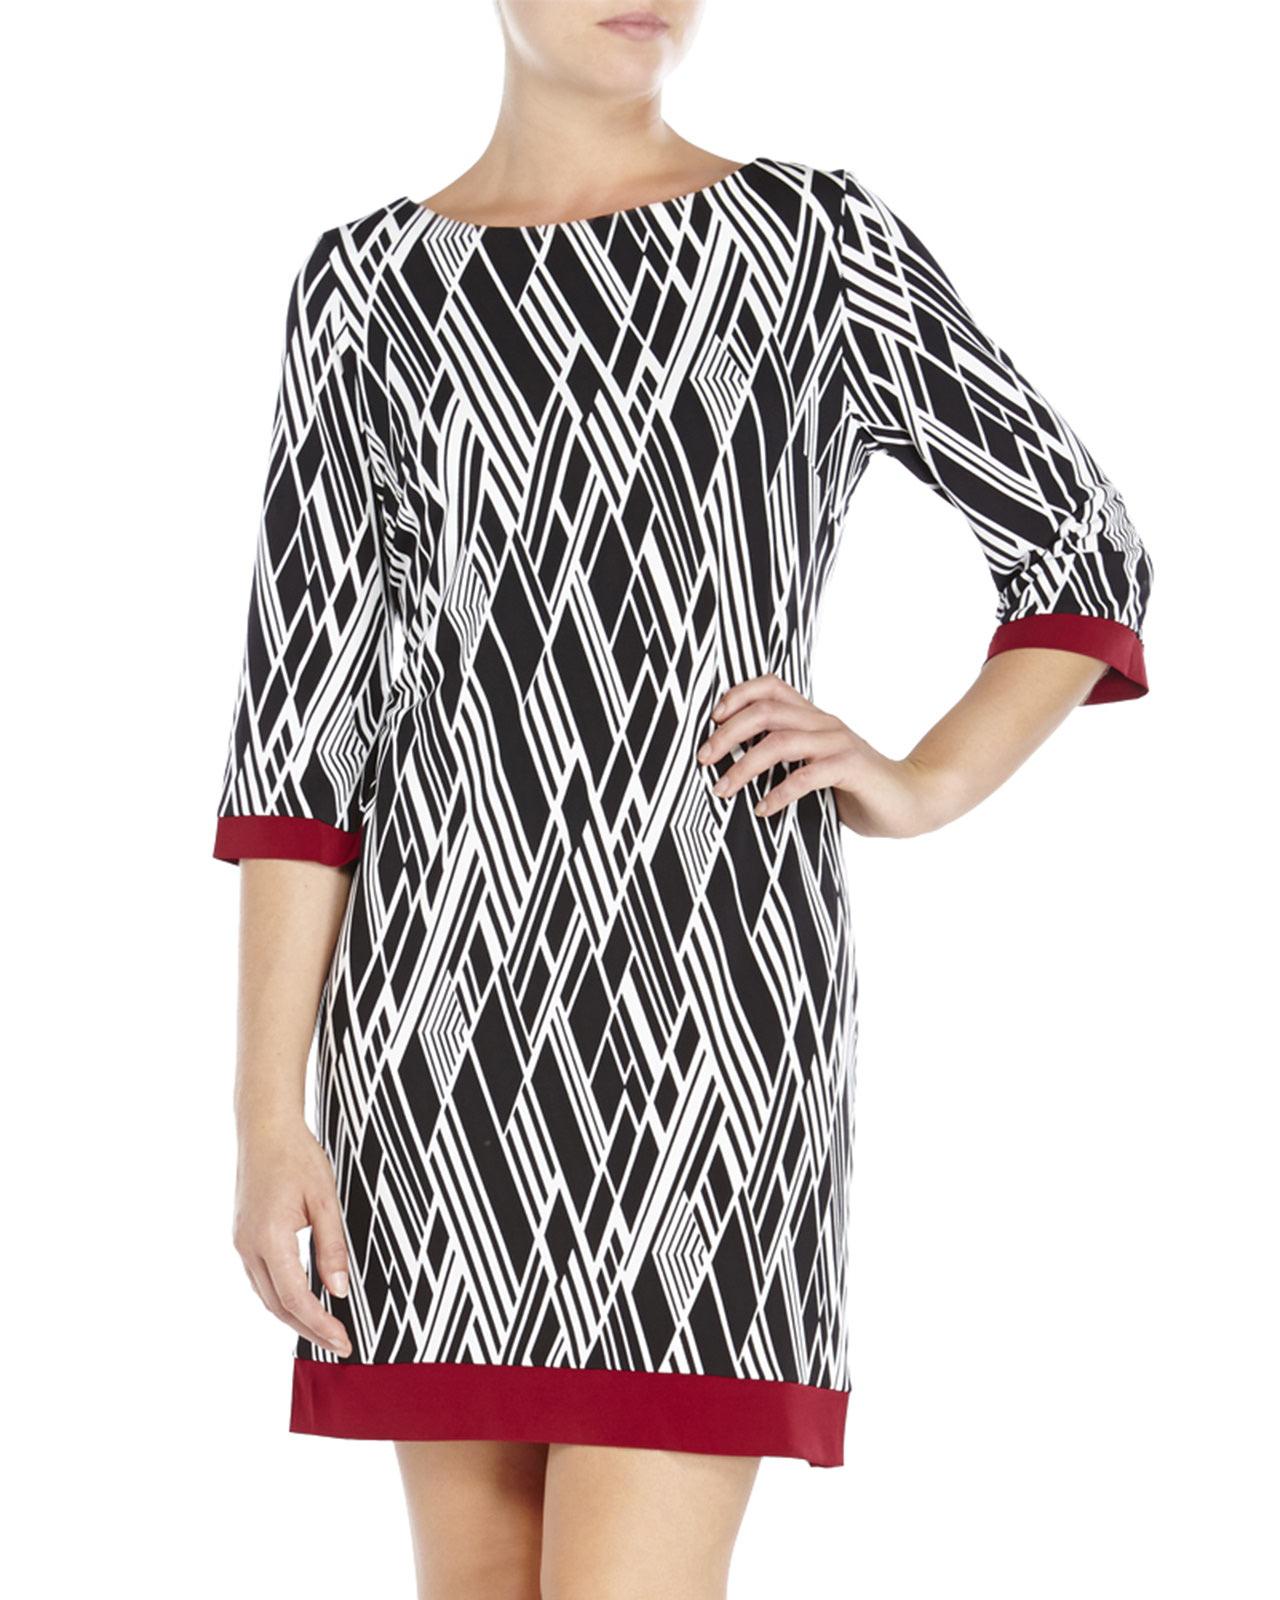 Sandra darren dresses black and white